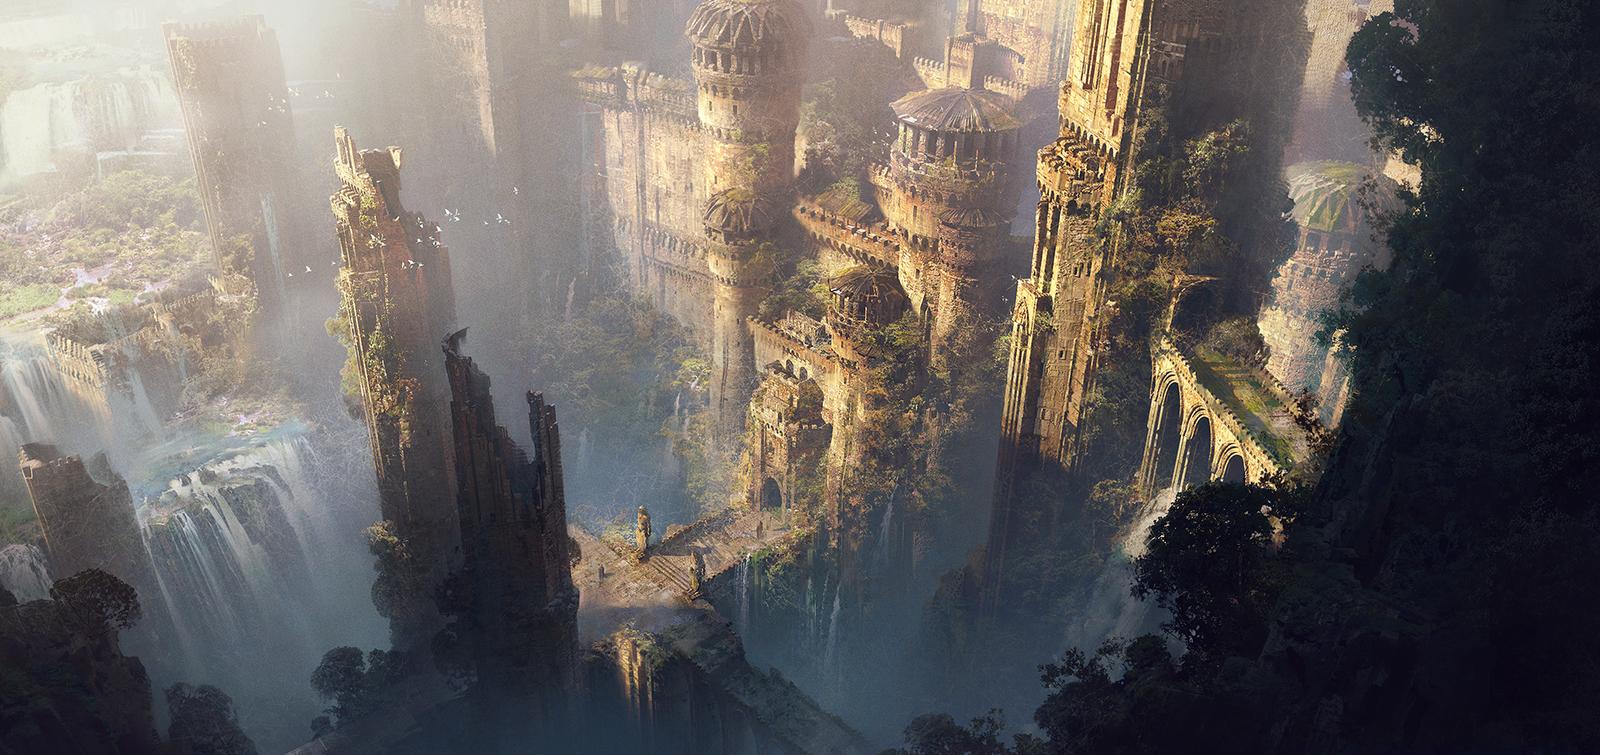 ruins_by_ivanlaliashvili-dbbf4sz.png